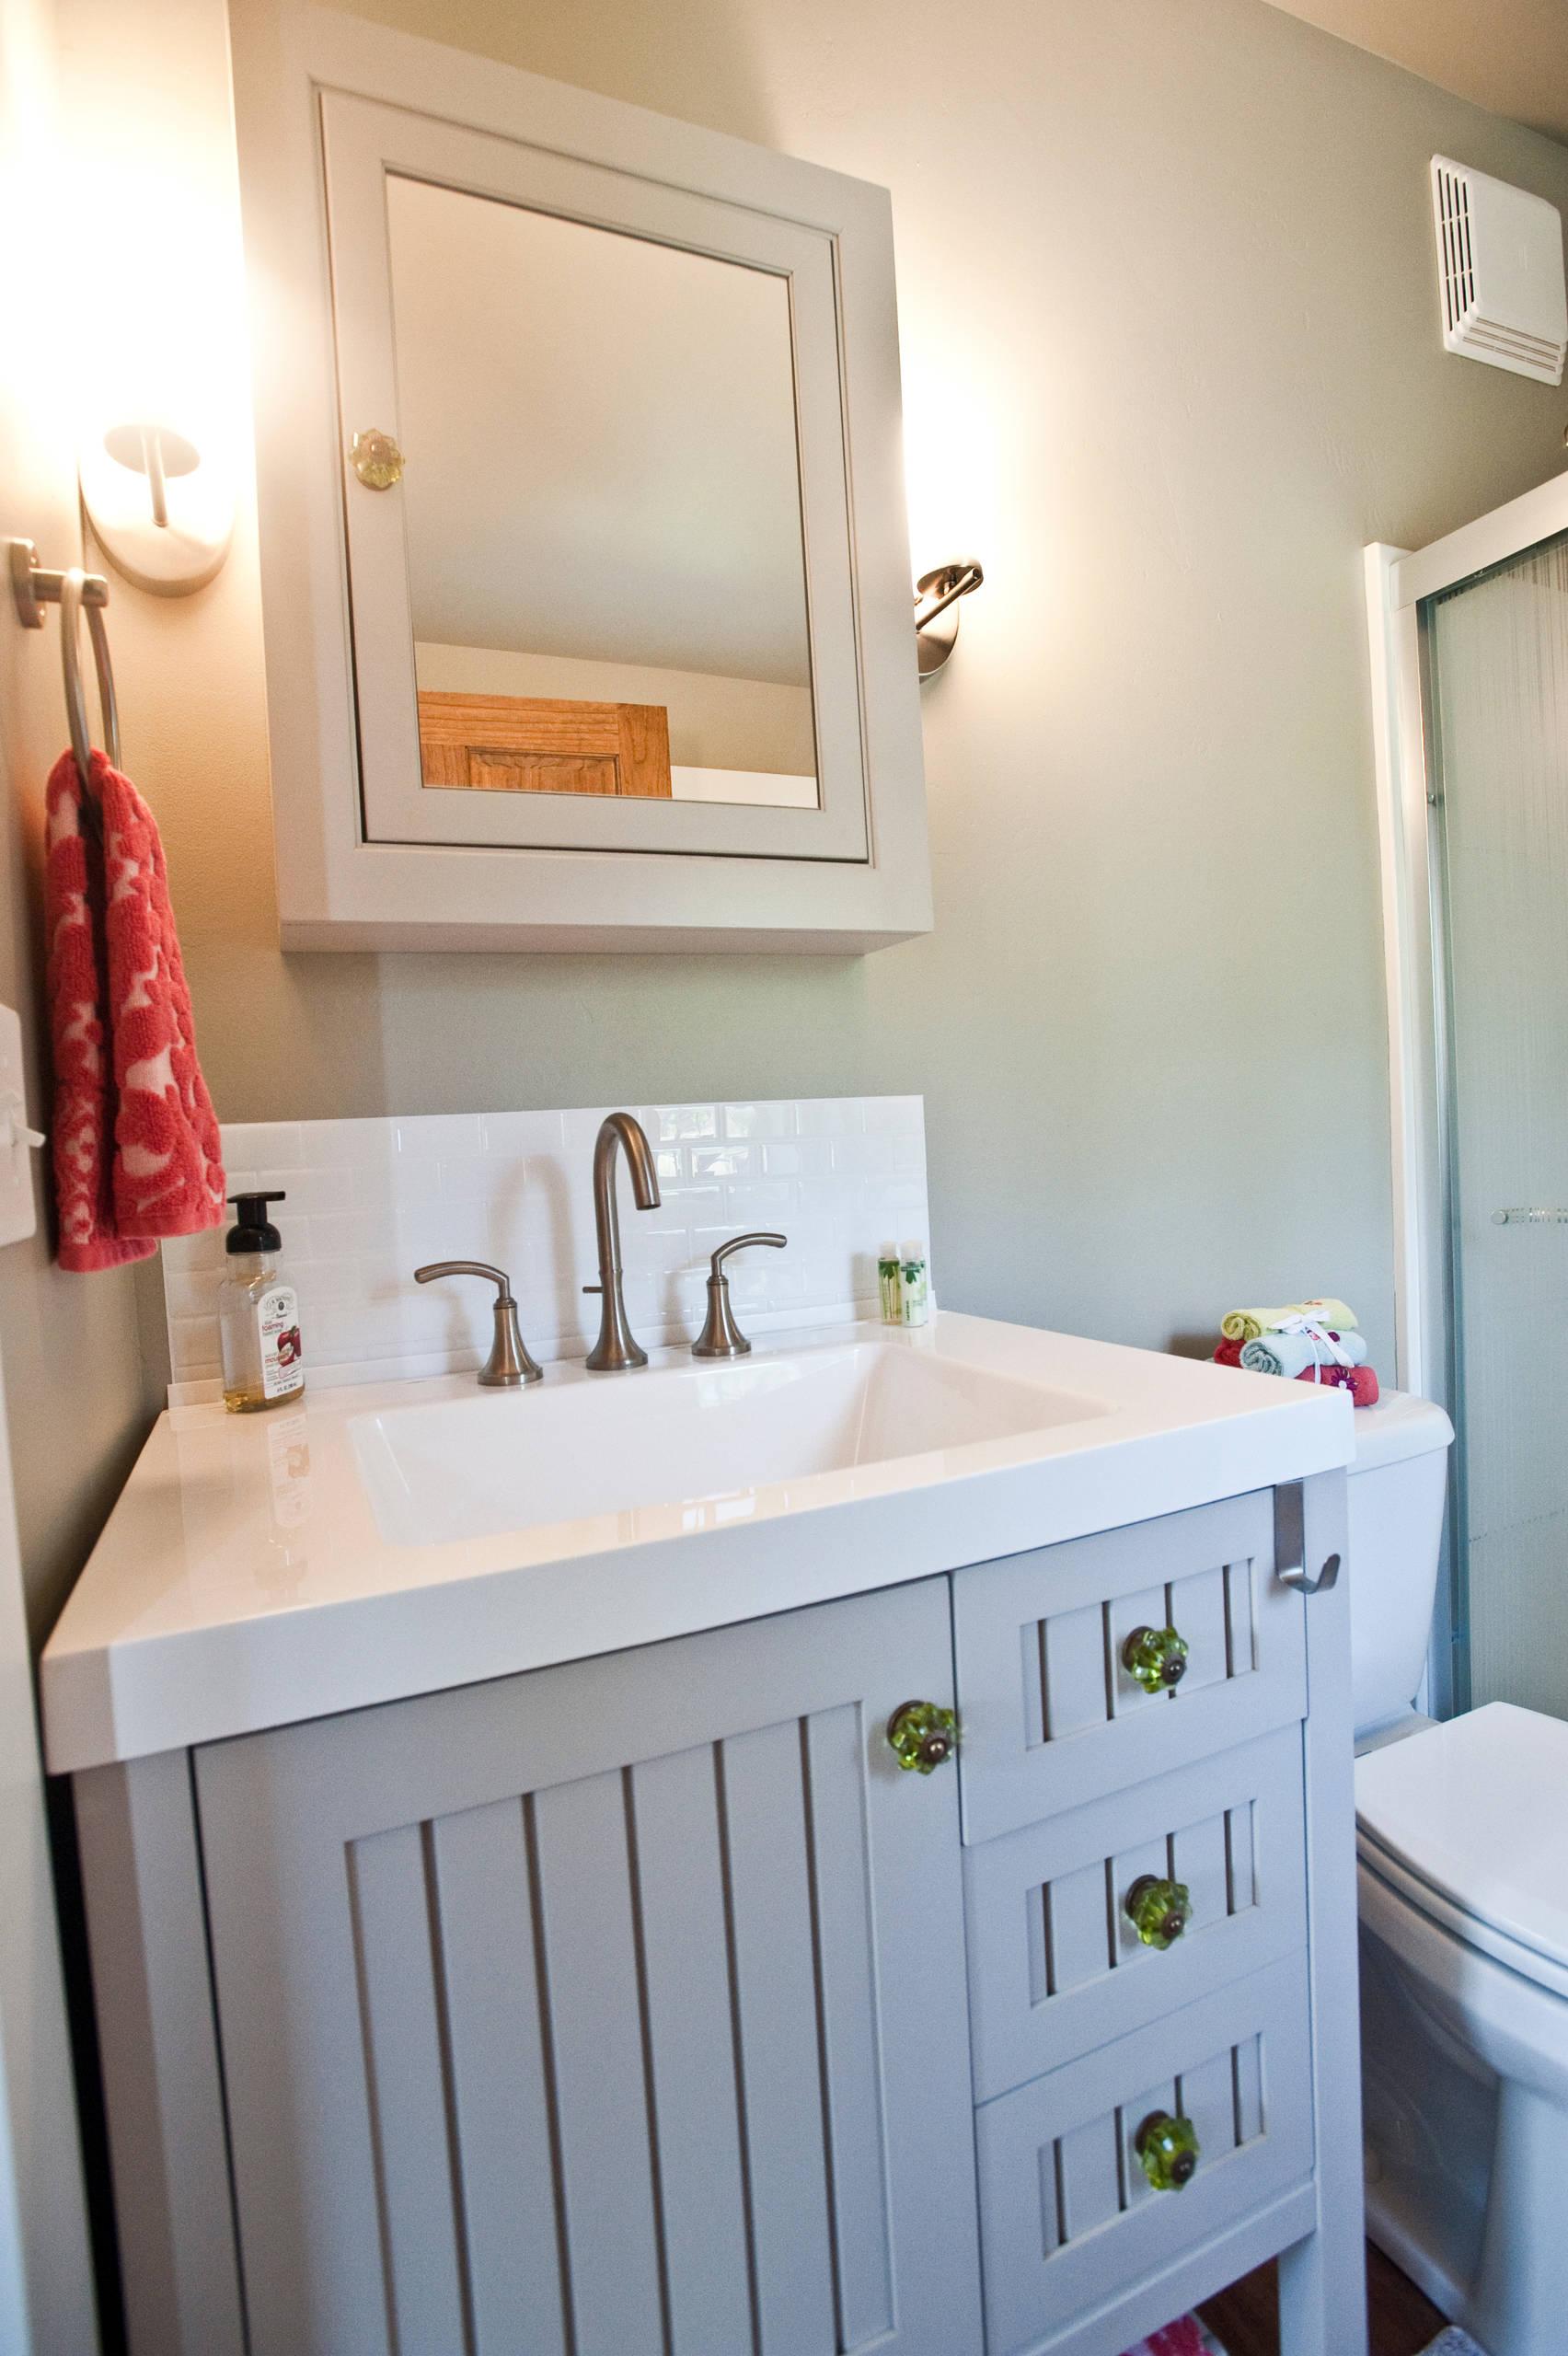 Peel Stick Bathroom Ideas Photos Houzz